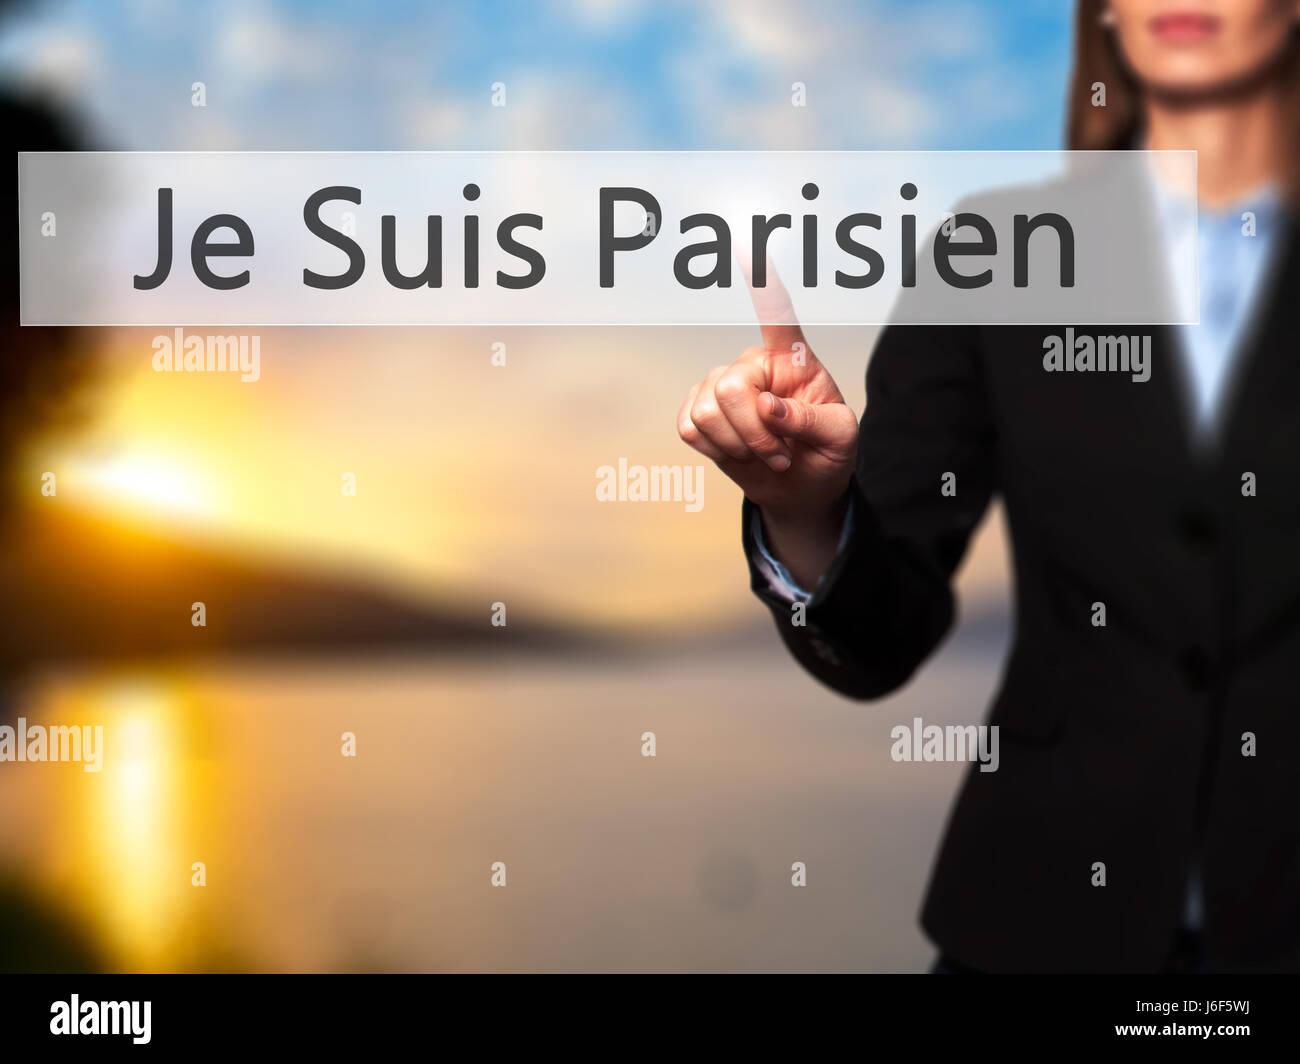 Je Suis Parisien ( I am Parisien)  - Businesswoman hand pressing button on touch screen interface. Business, technology, Stock Photo